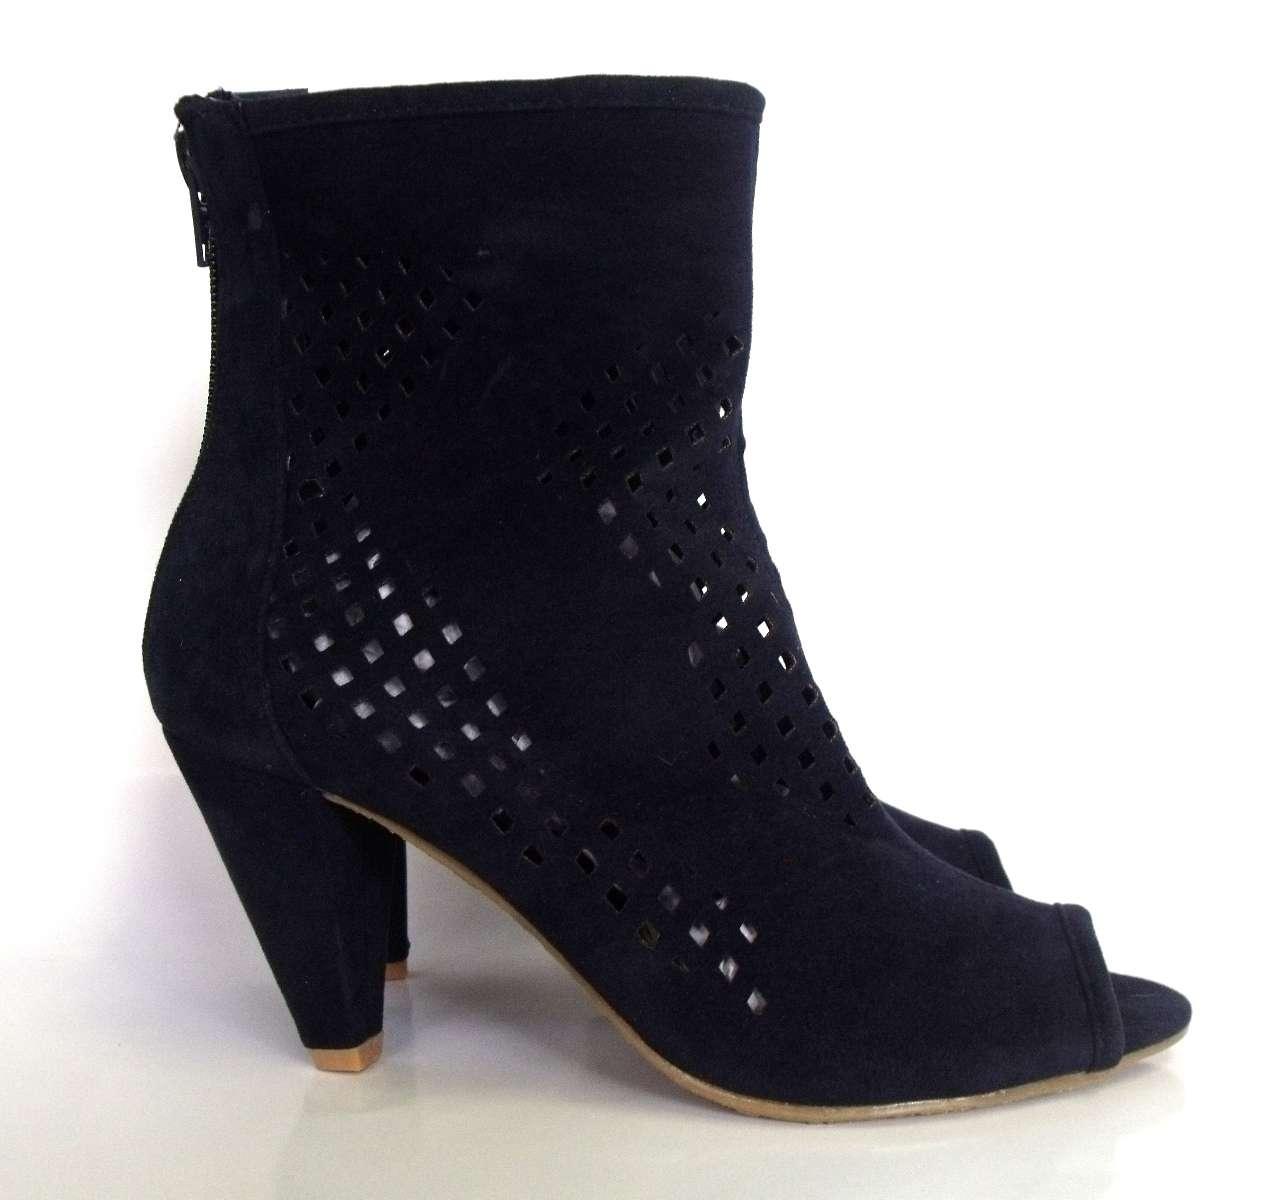 new high heel ankle shoes karmil navy n1002 ebay